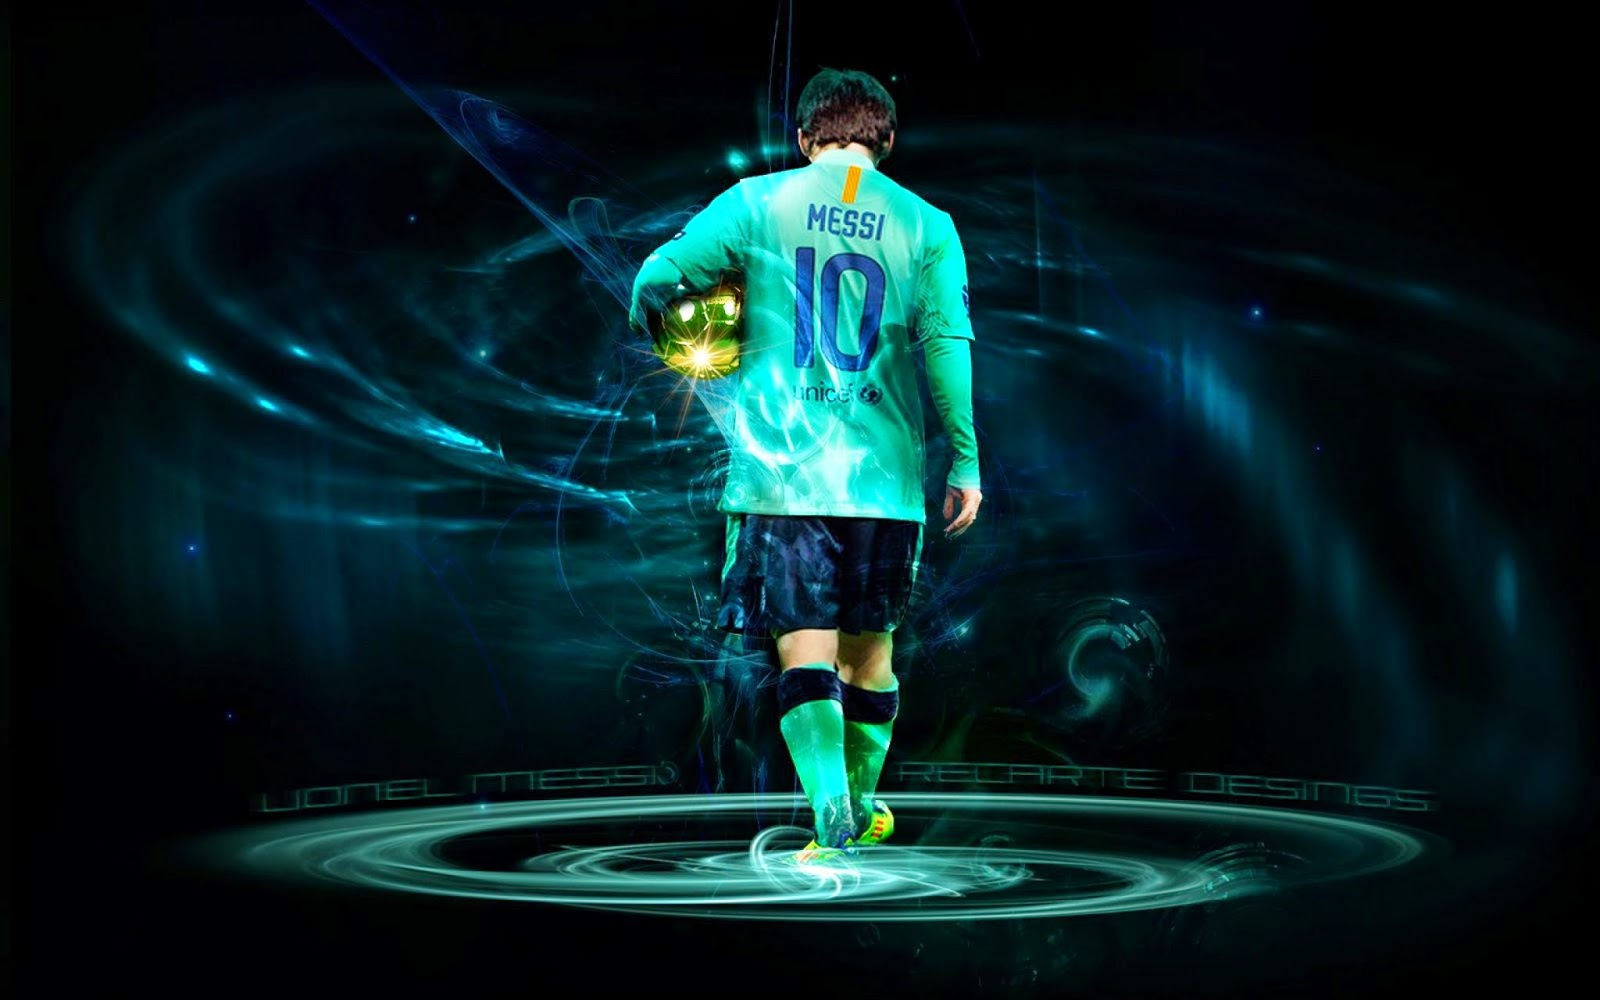 Descargar FIFA 18 para PC - Gratis en Español